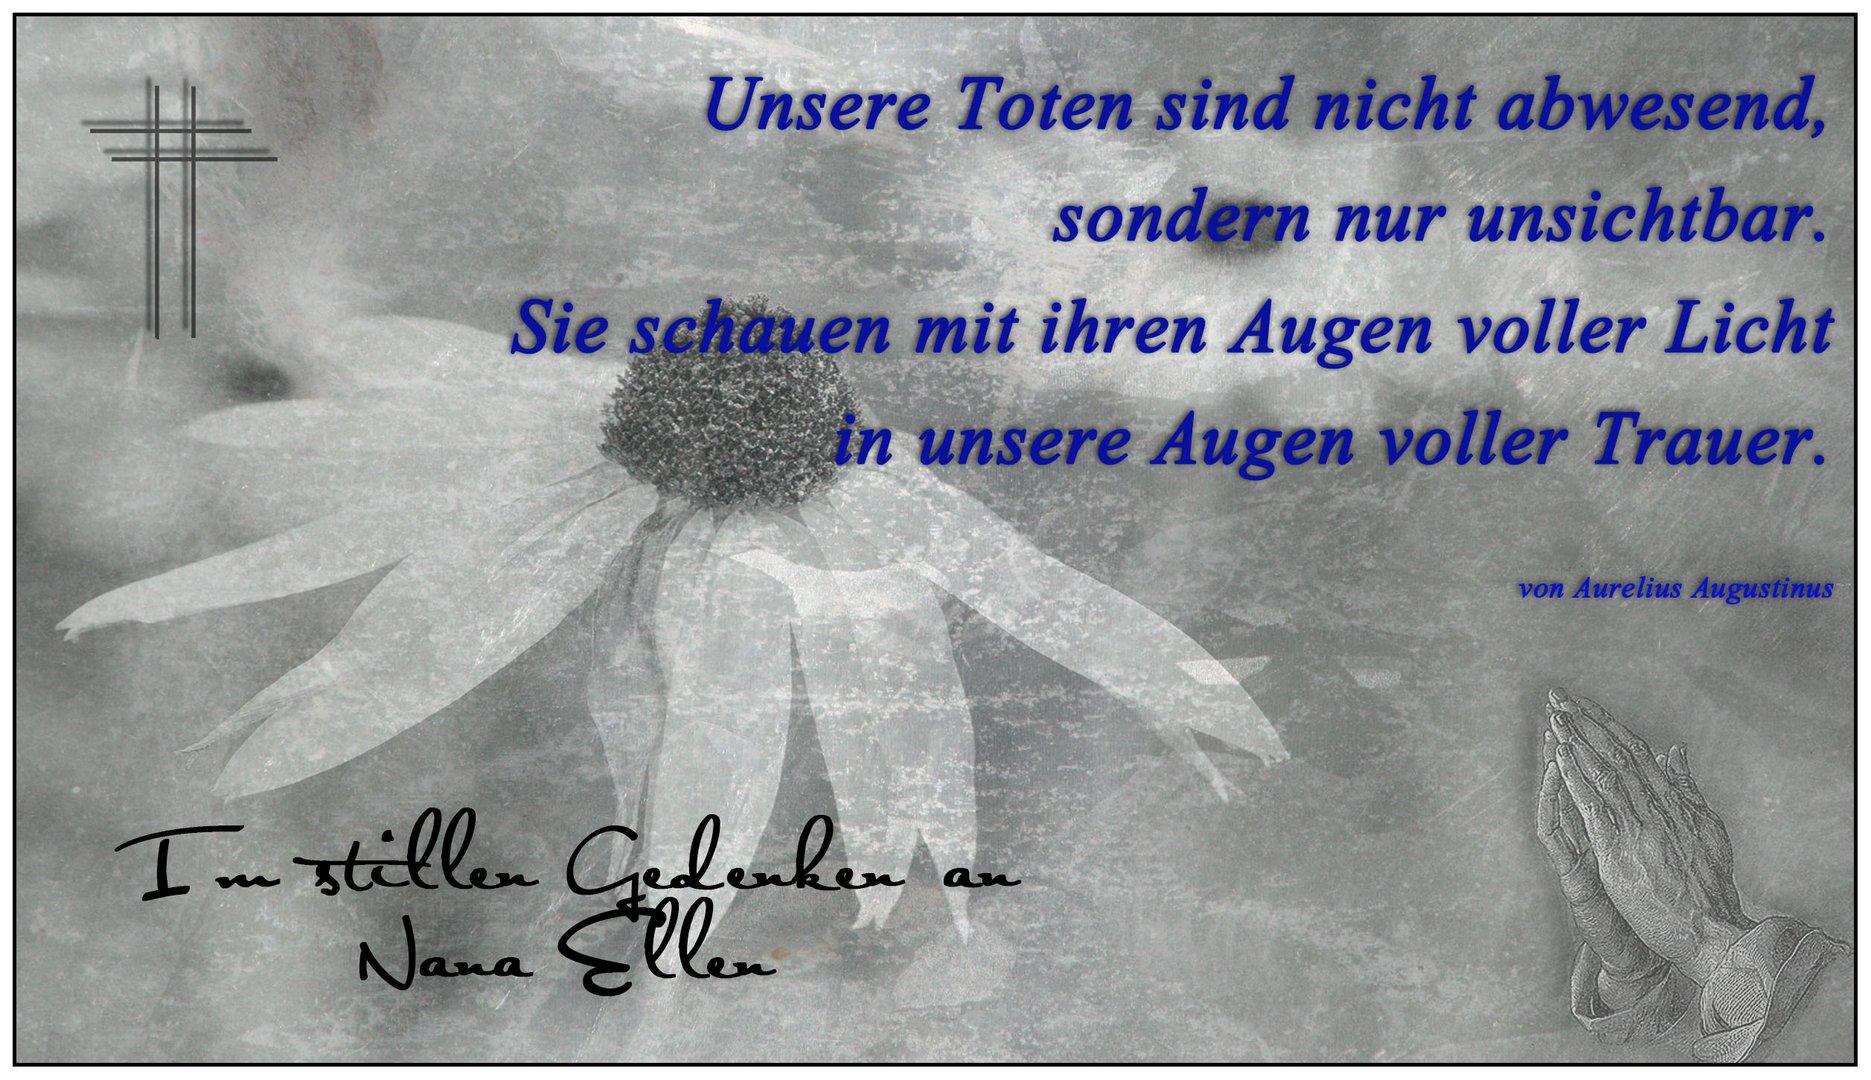 Im stillen Gedenken an Nana Ellen